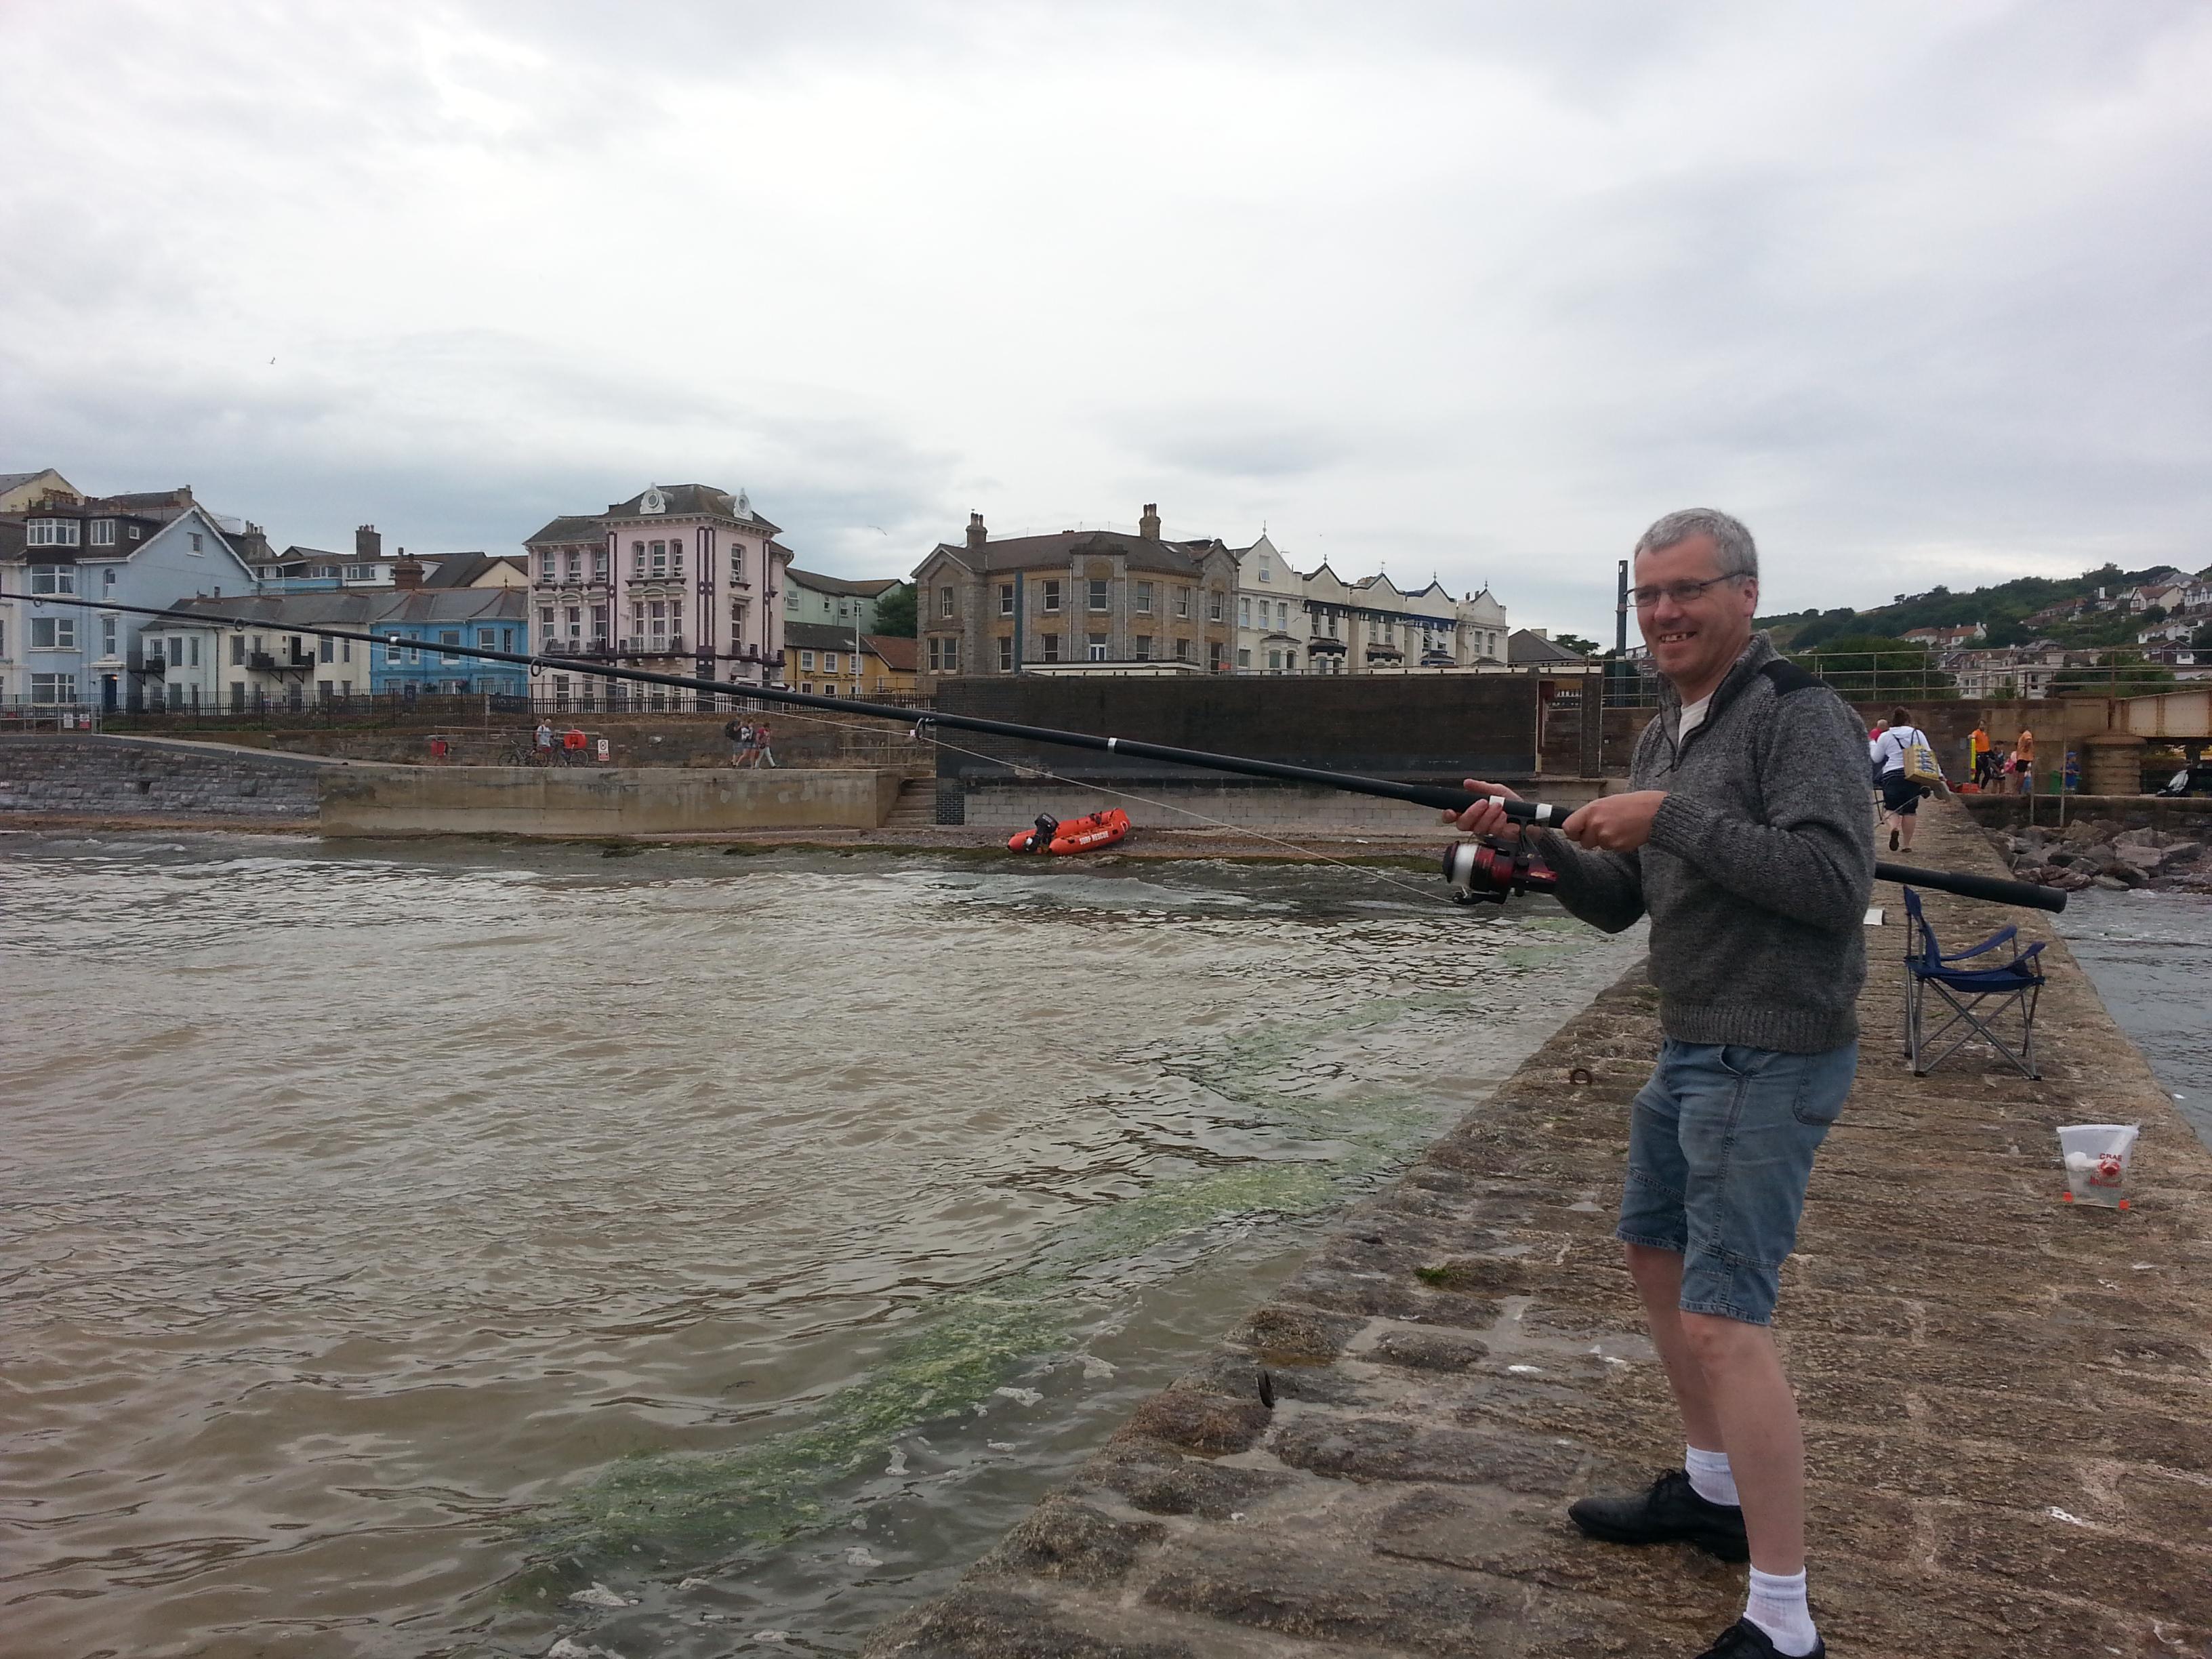 Mackerel fishing 2016 dawlish celebrates carnival for Fishing videos 2016